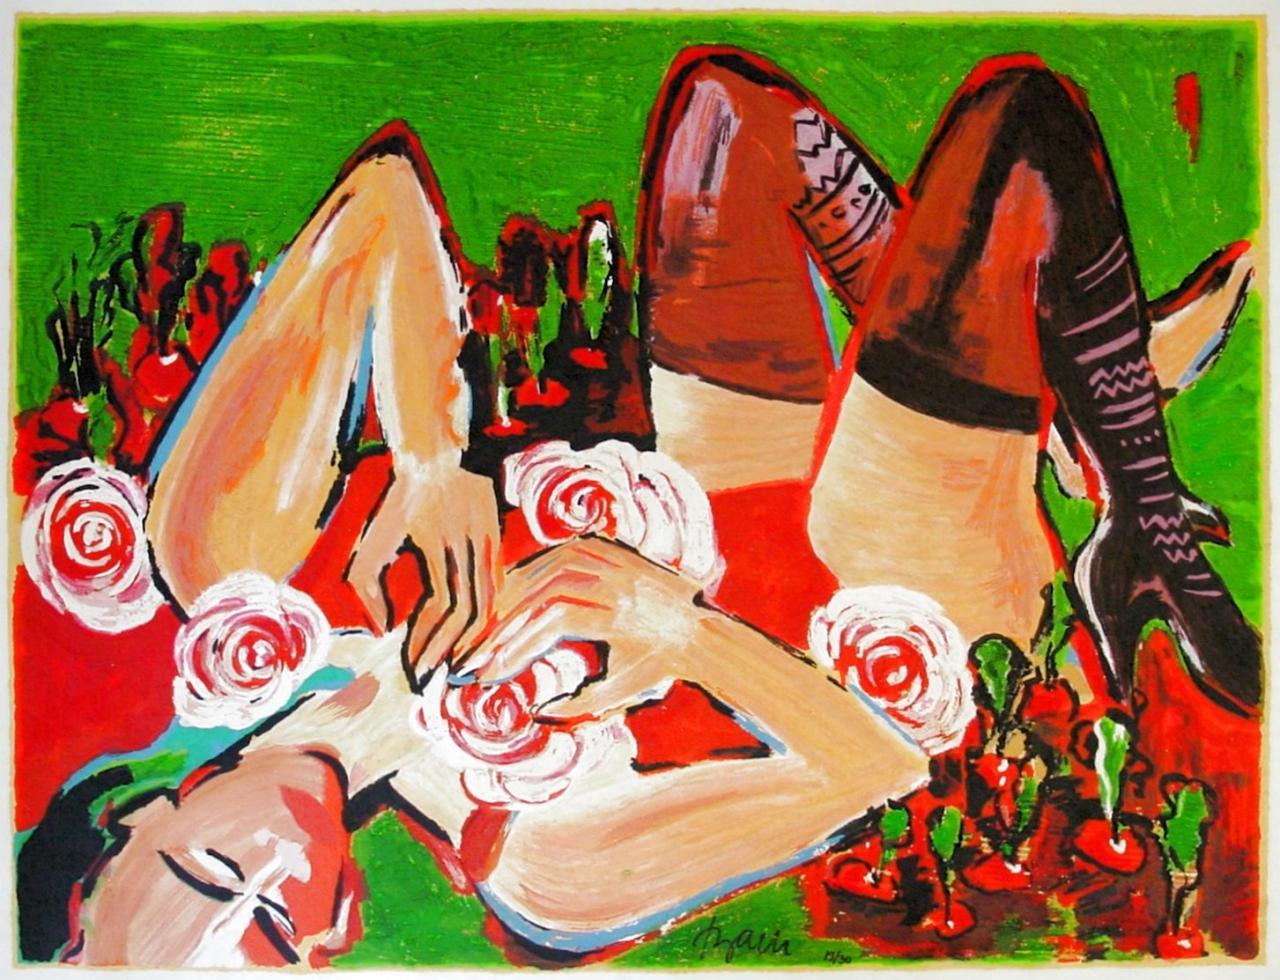 Rosa Diva - 2002 - Papier